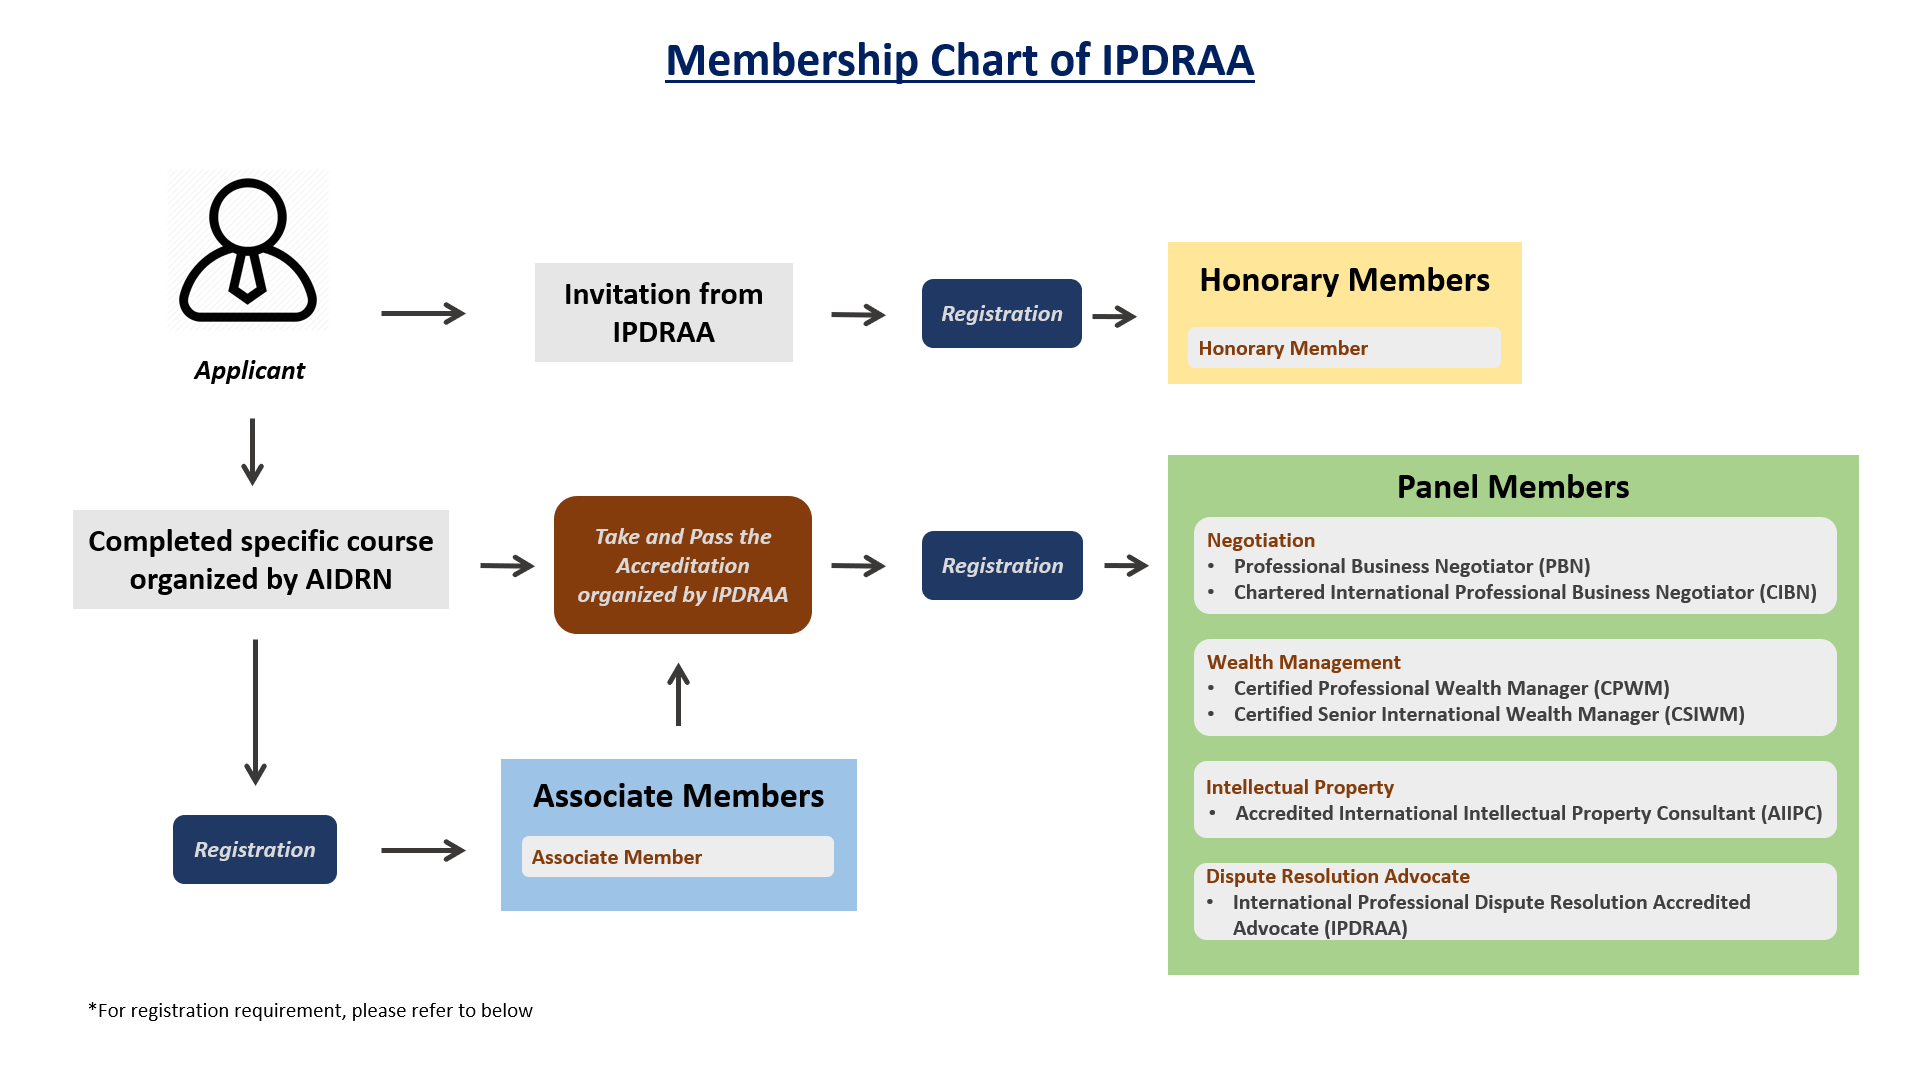 IPDRAA member chart [EN]